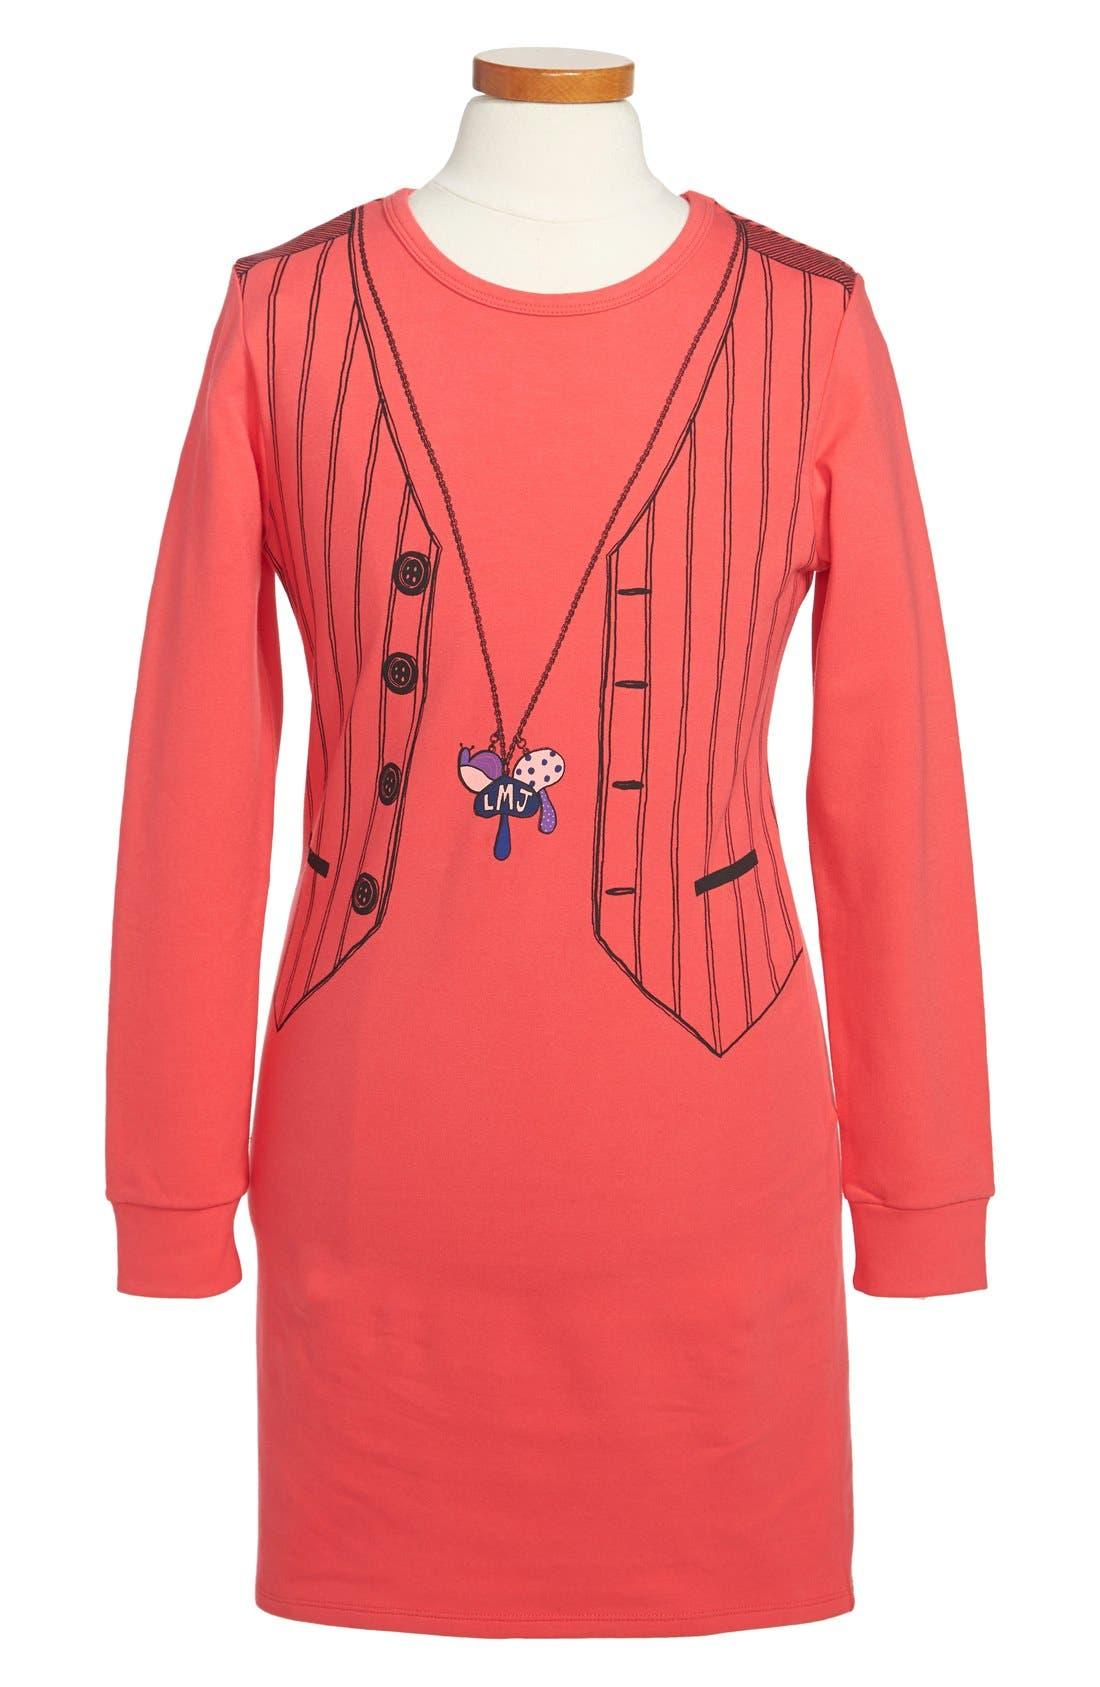 Alternate Image 1 Selected - LITTLE MARC JACOBS 'Tromp l'Oeil' Dress (Toddler Girls, Little Girls & Big Girls)